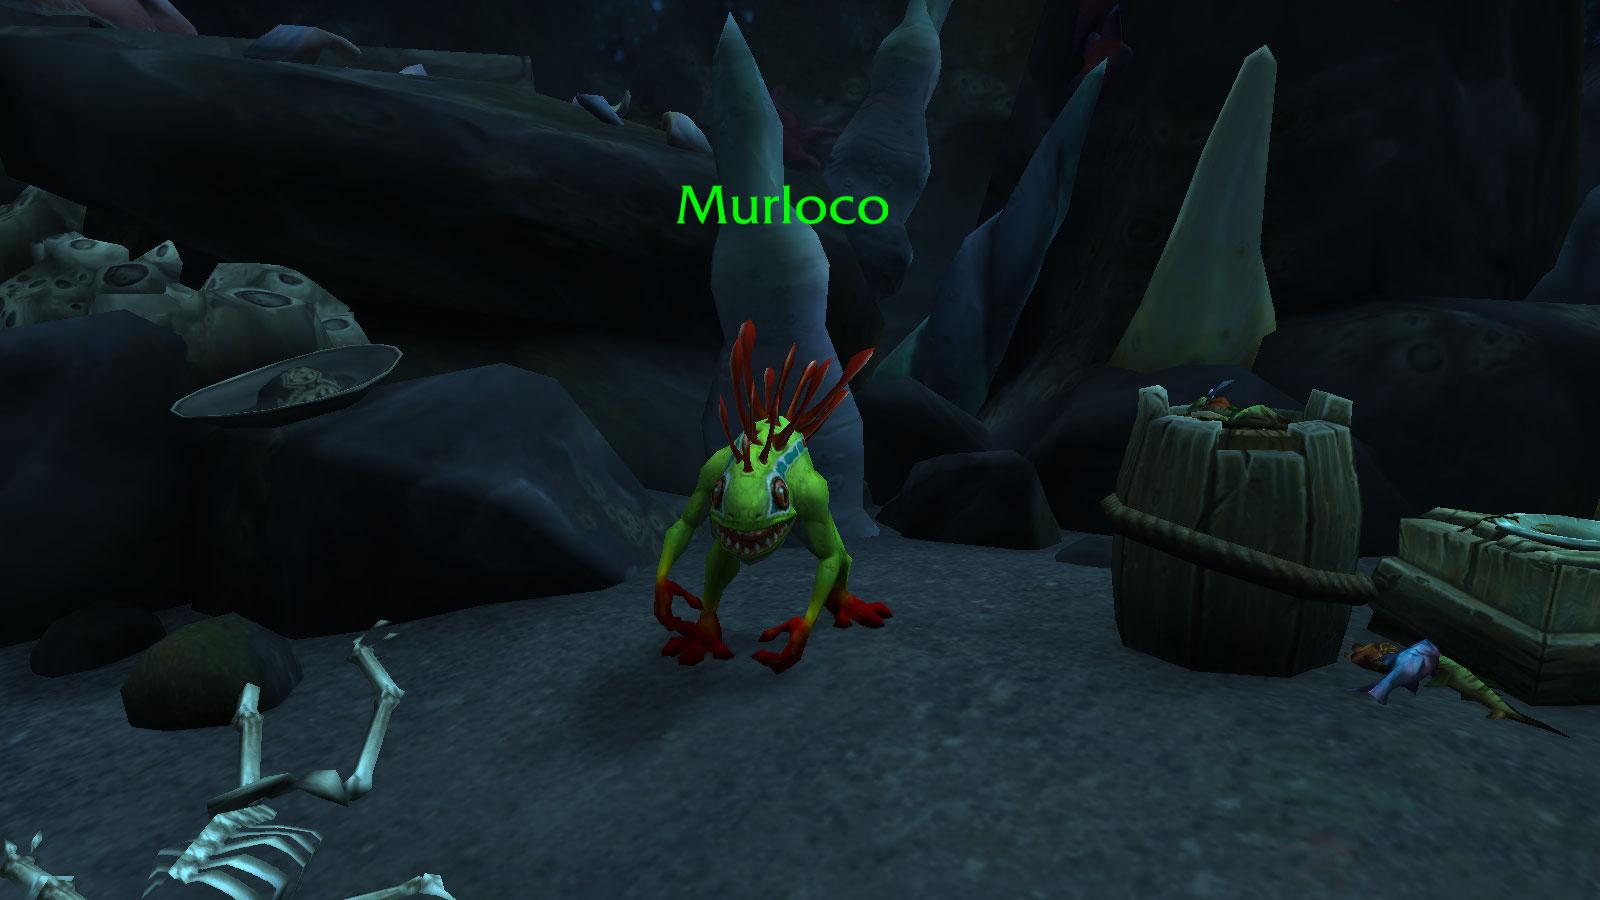 Murloco apparaît seulement pendant 5 minutes